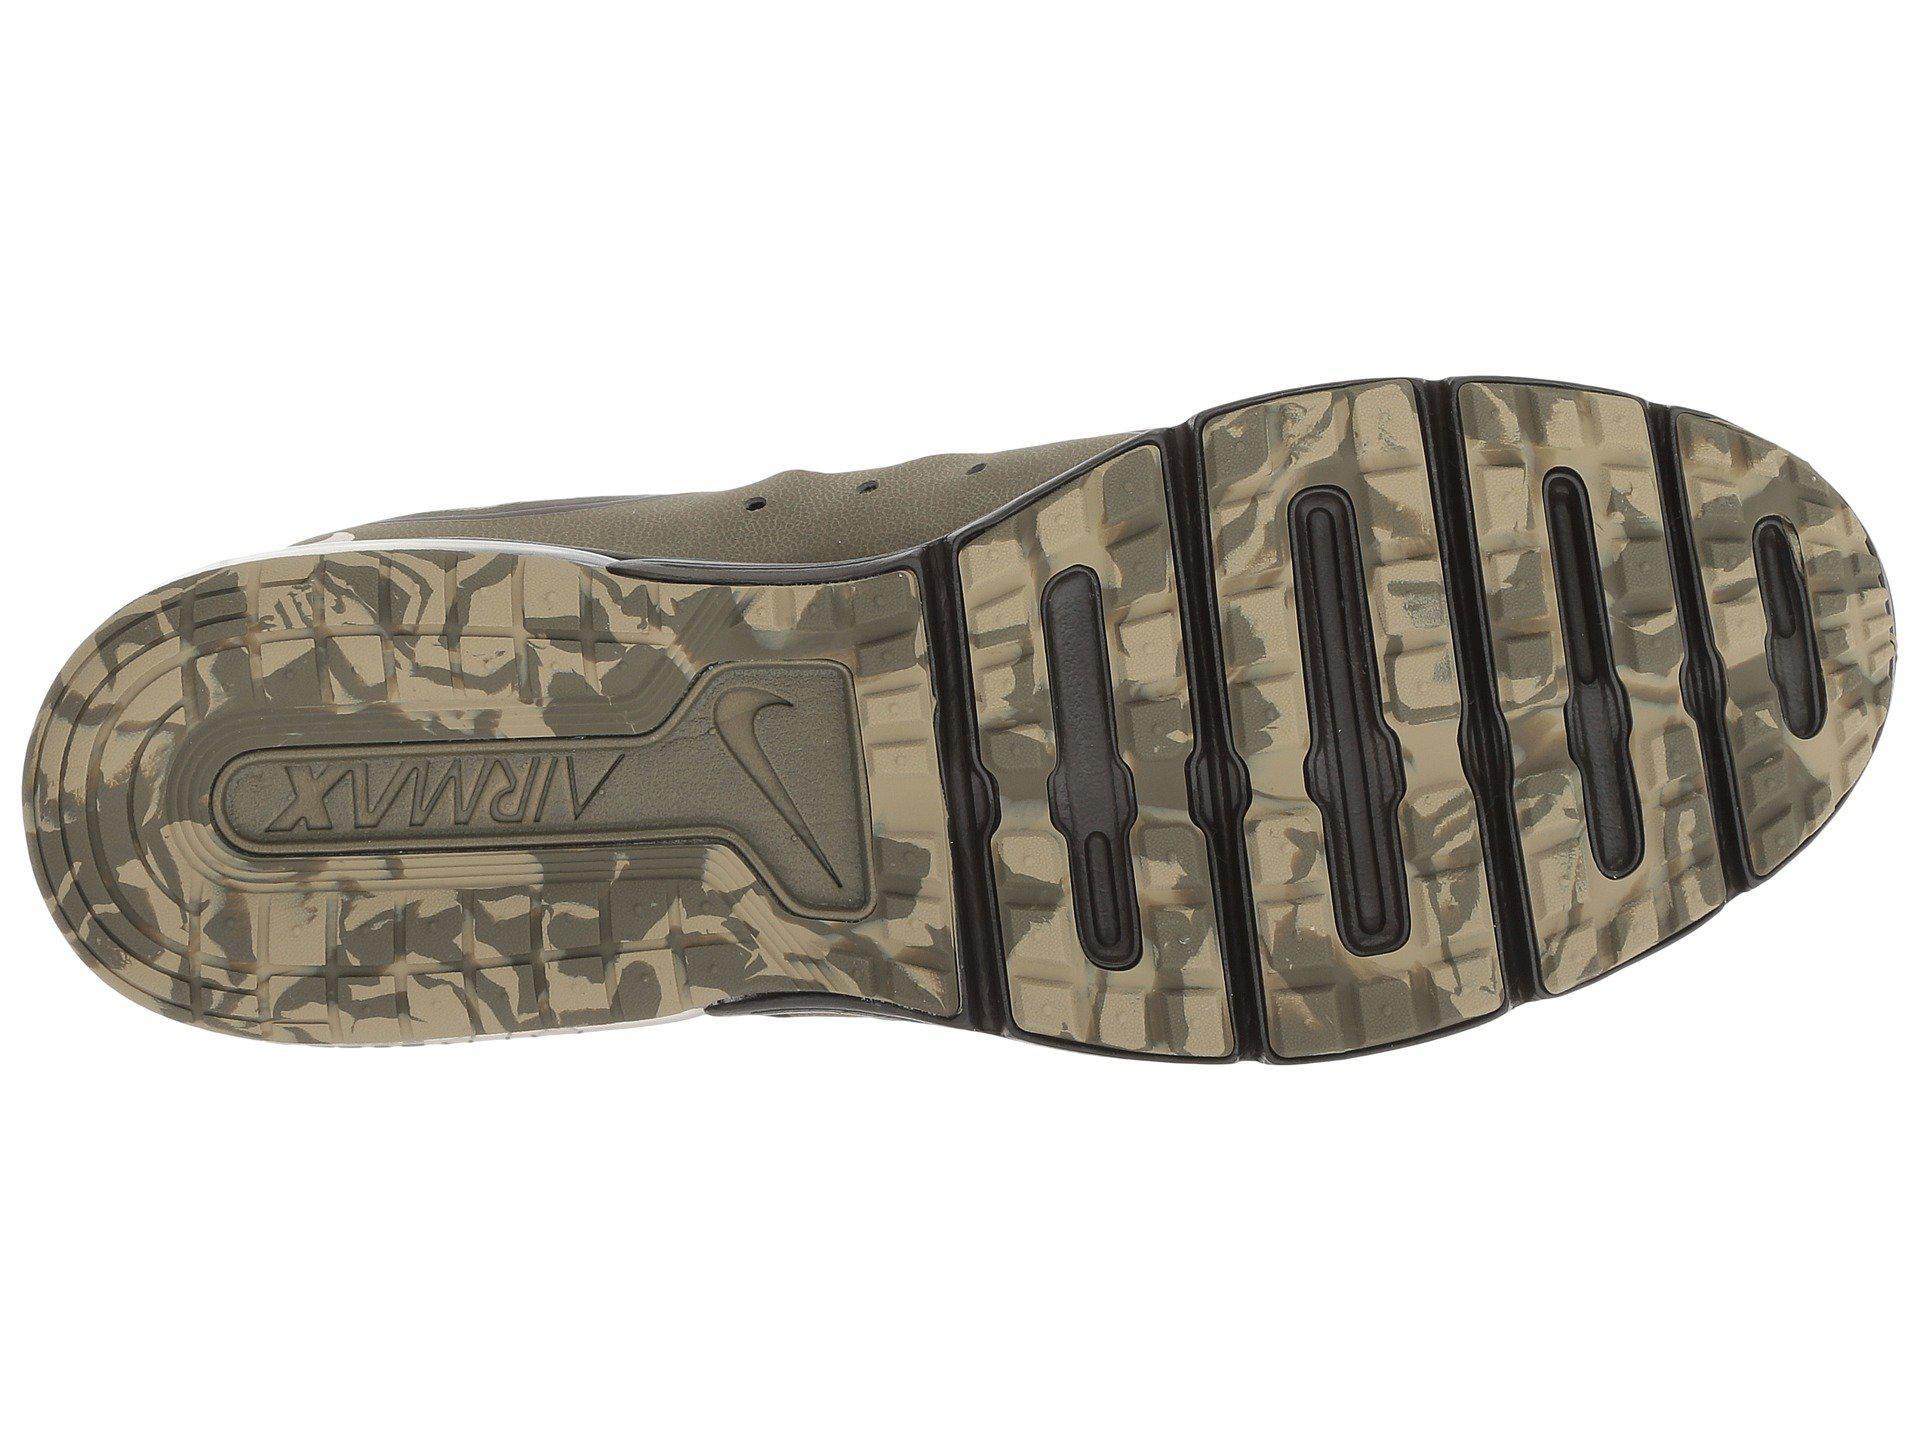 f857c2e0bc2 Nike - Green Air Max Sequent 3 Premium for Men - Lyst. View fullscreen